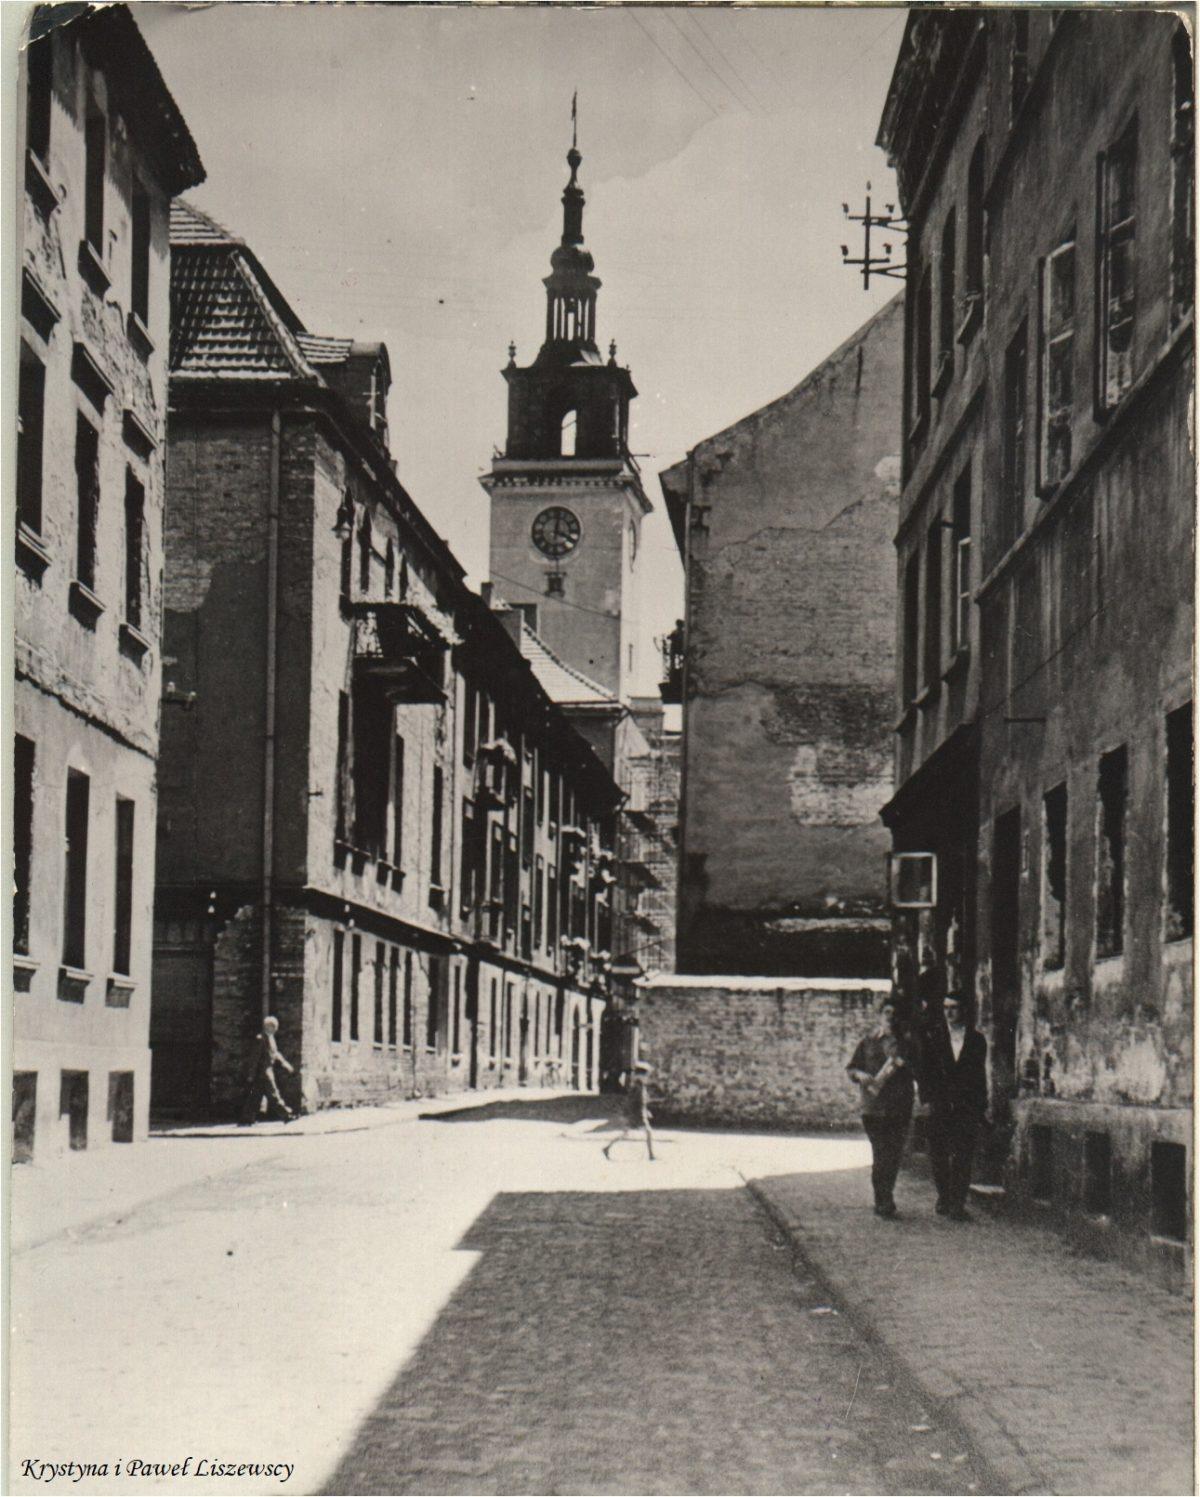 Piskorzewska